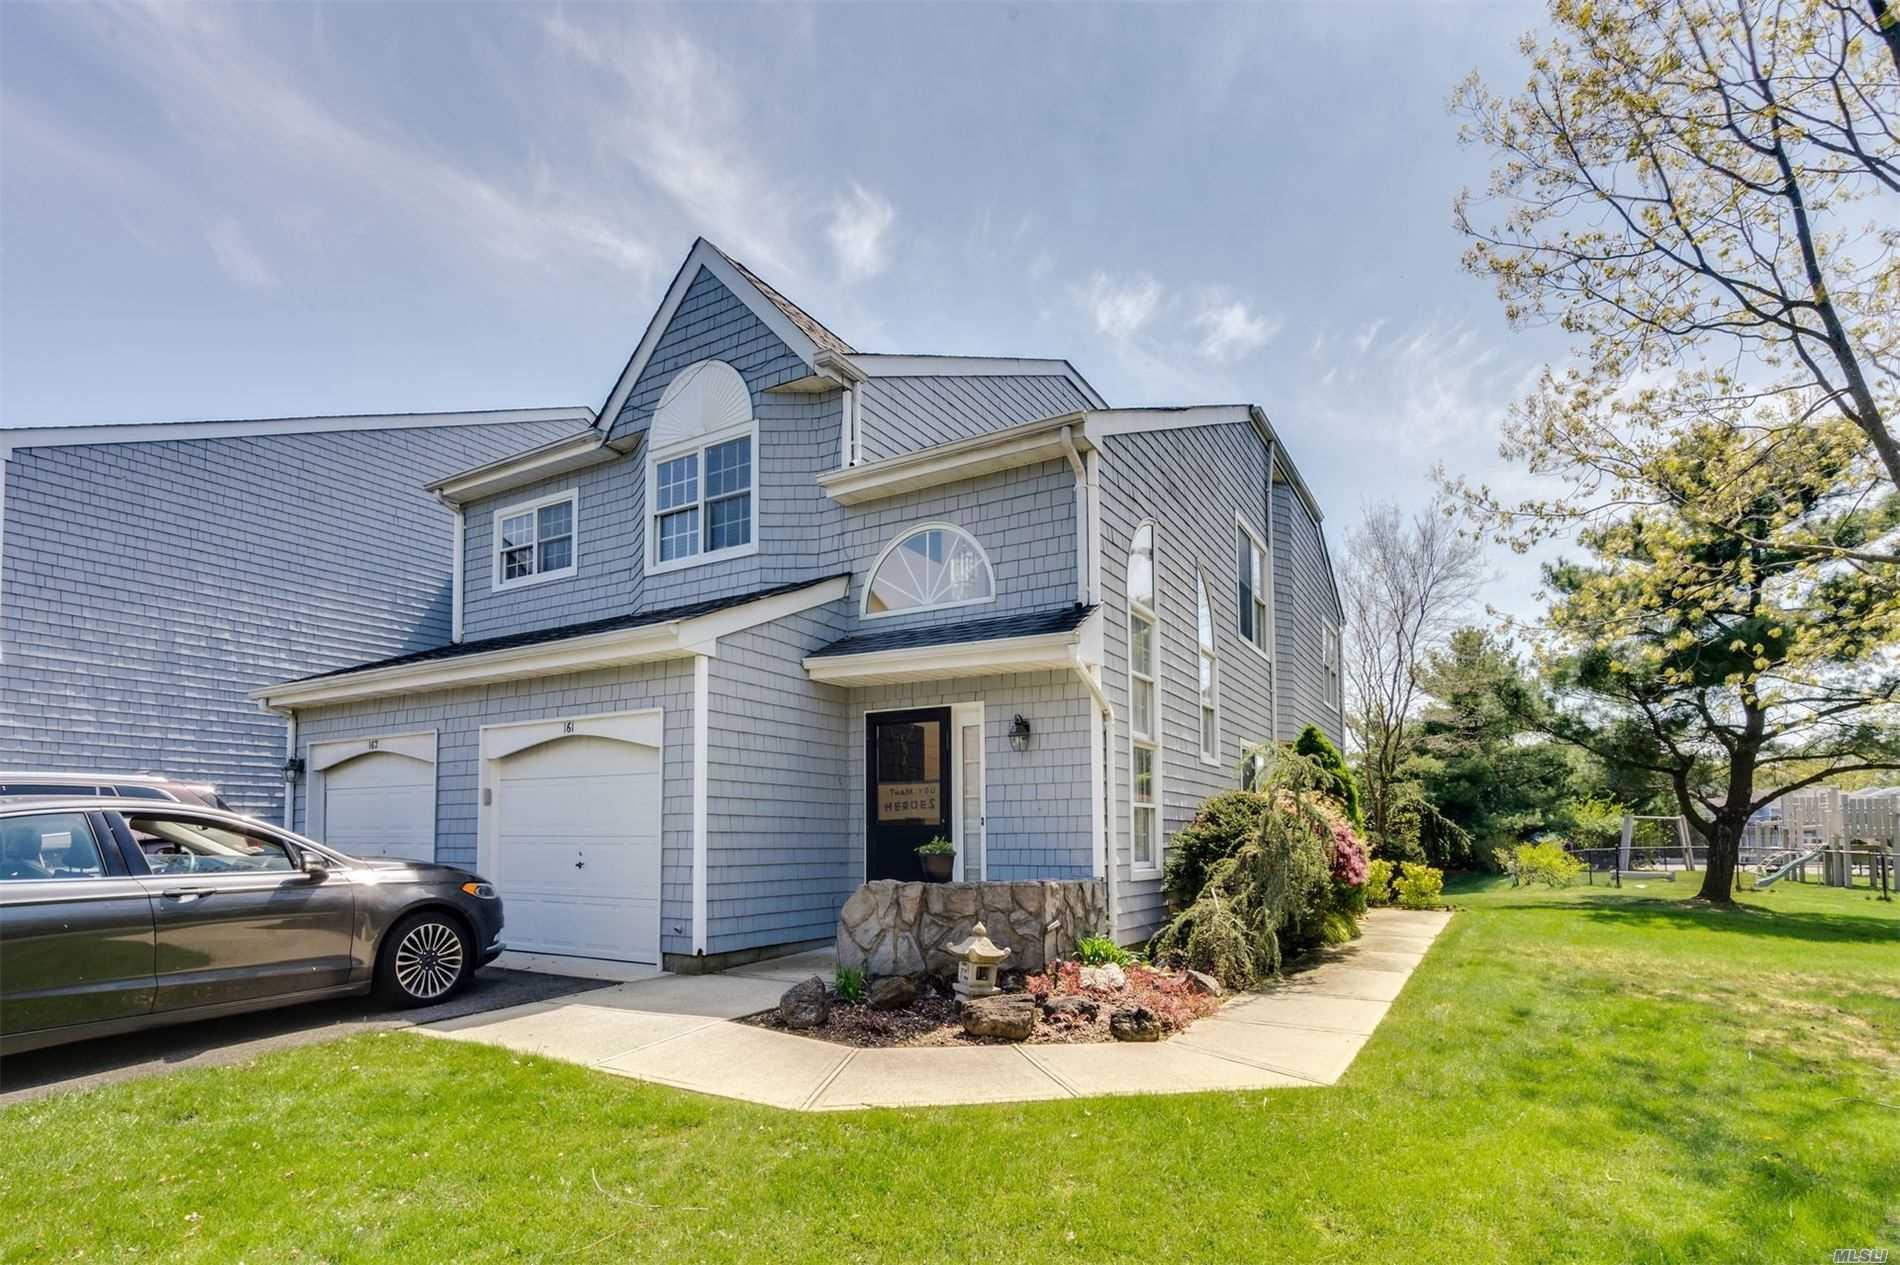 Property for sale at 161 Lakebridge Dr, Kings Park NY 11754, Kings Park,  New York 11754